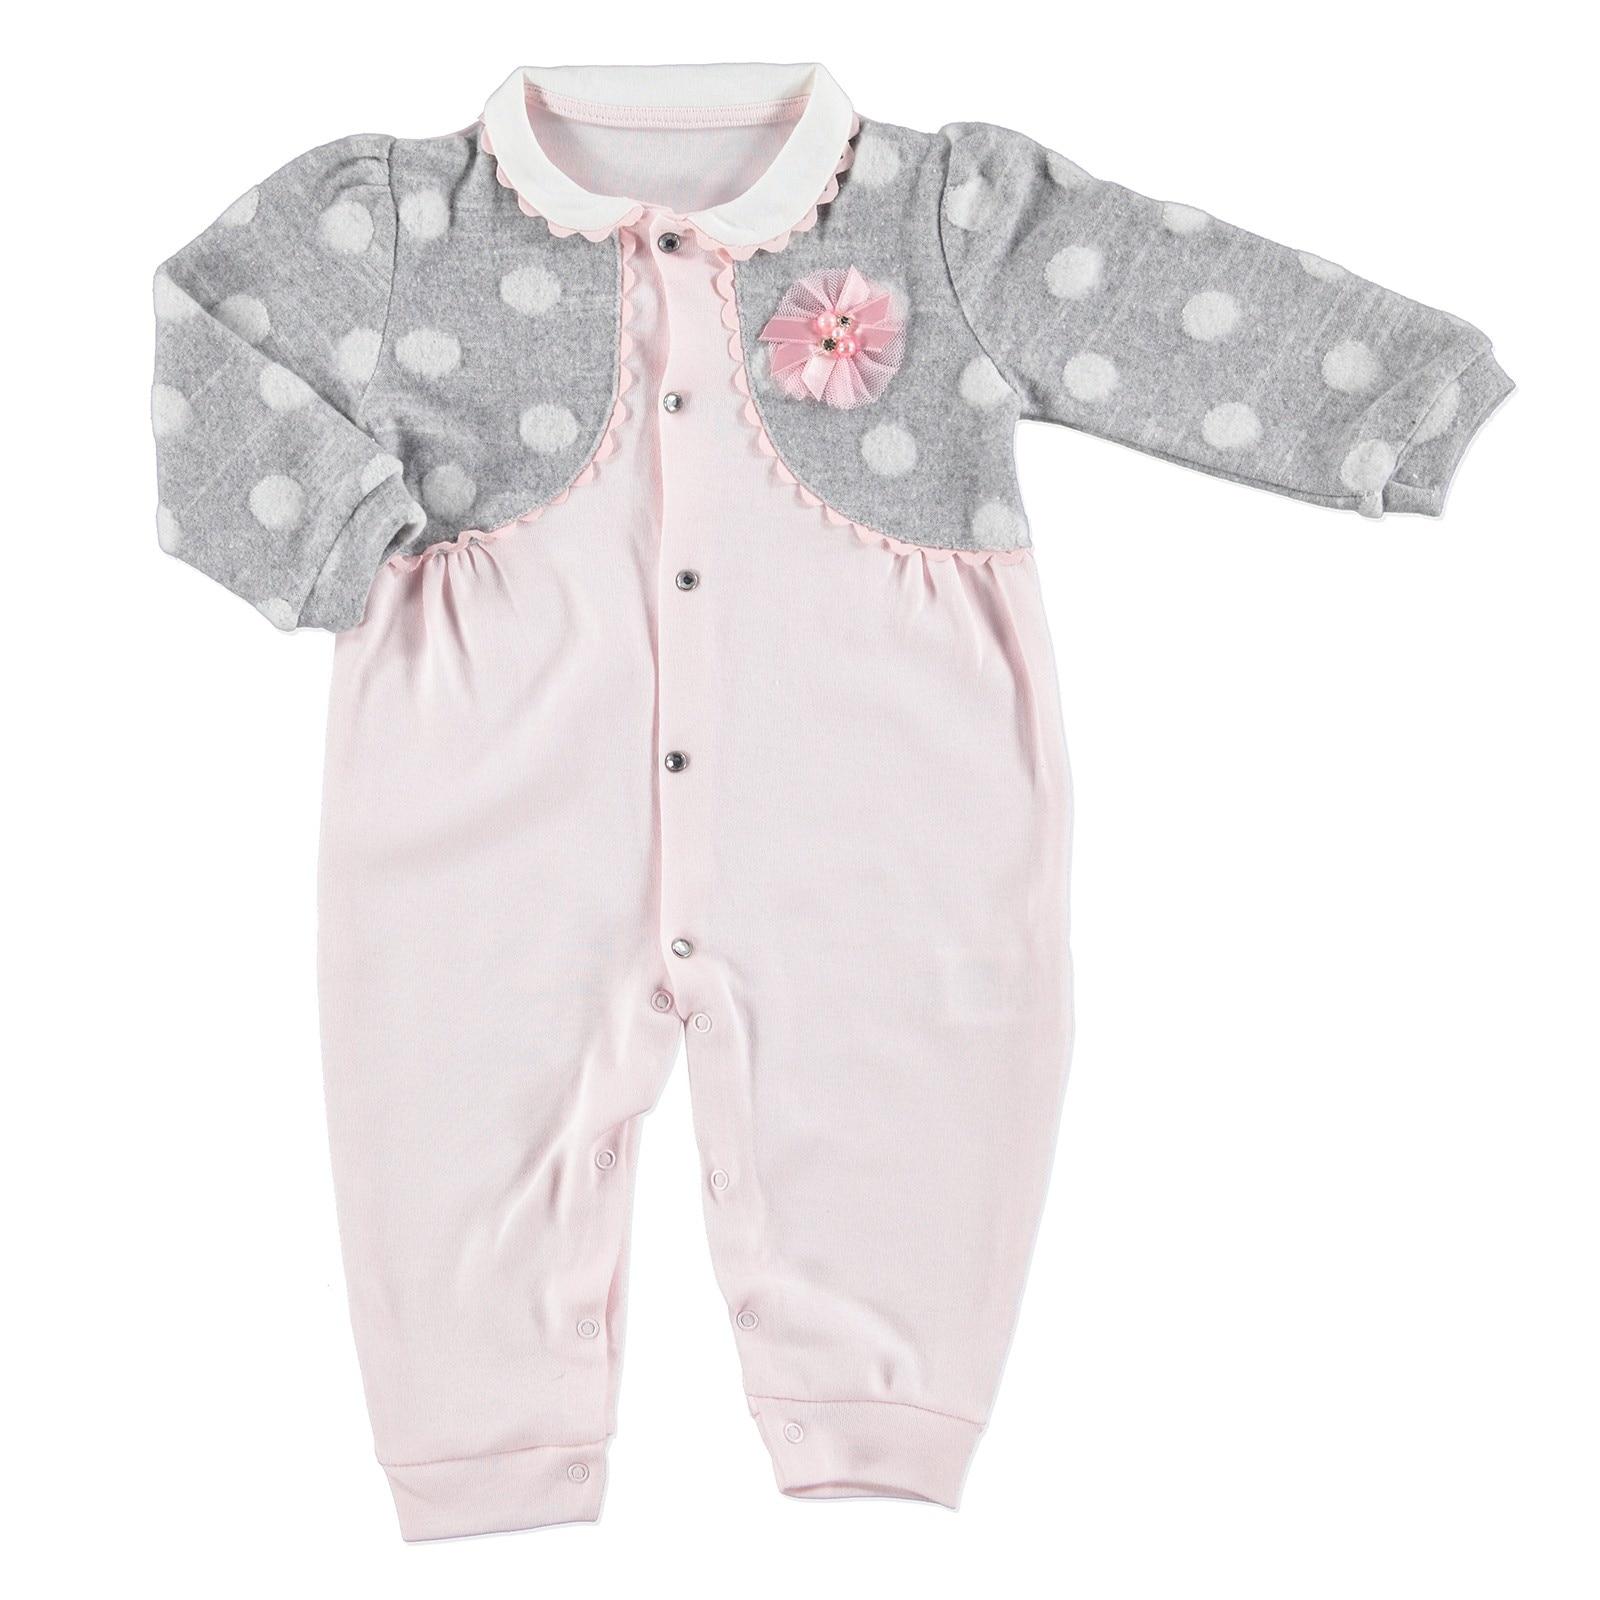 Winnie The Pooh Romper 0-18 Months Infant Fancy Dress Disney Babies Boys Costume